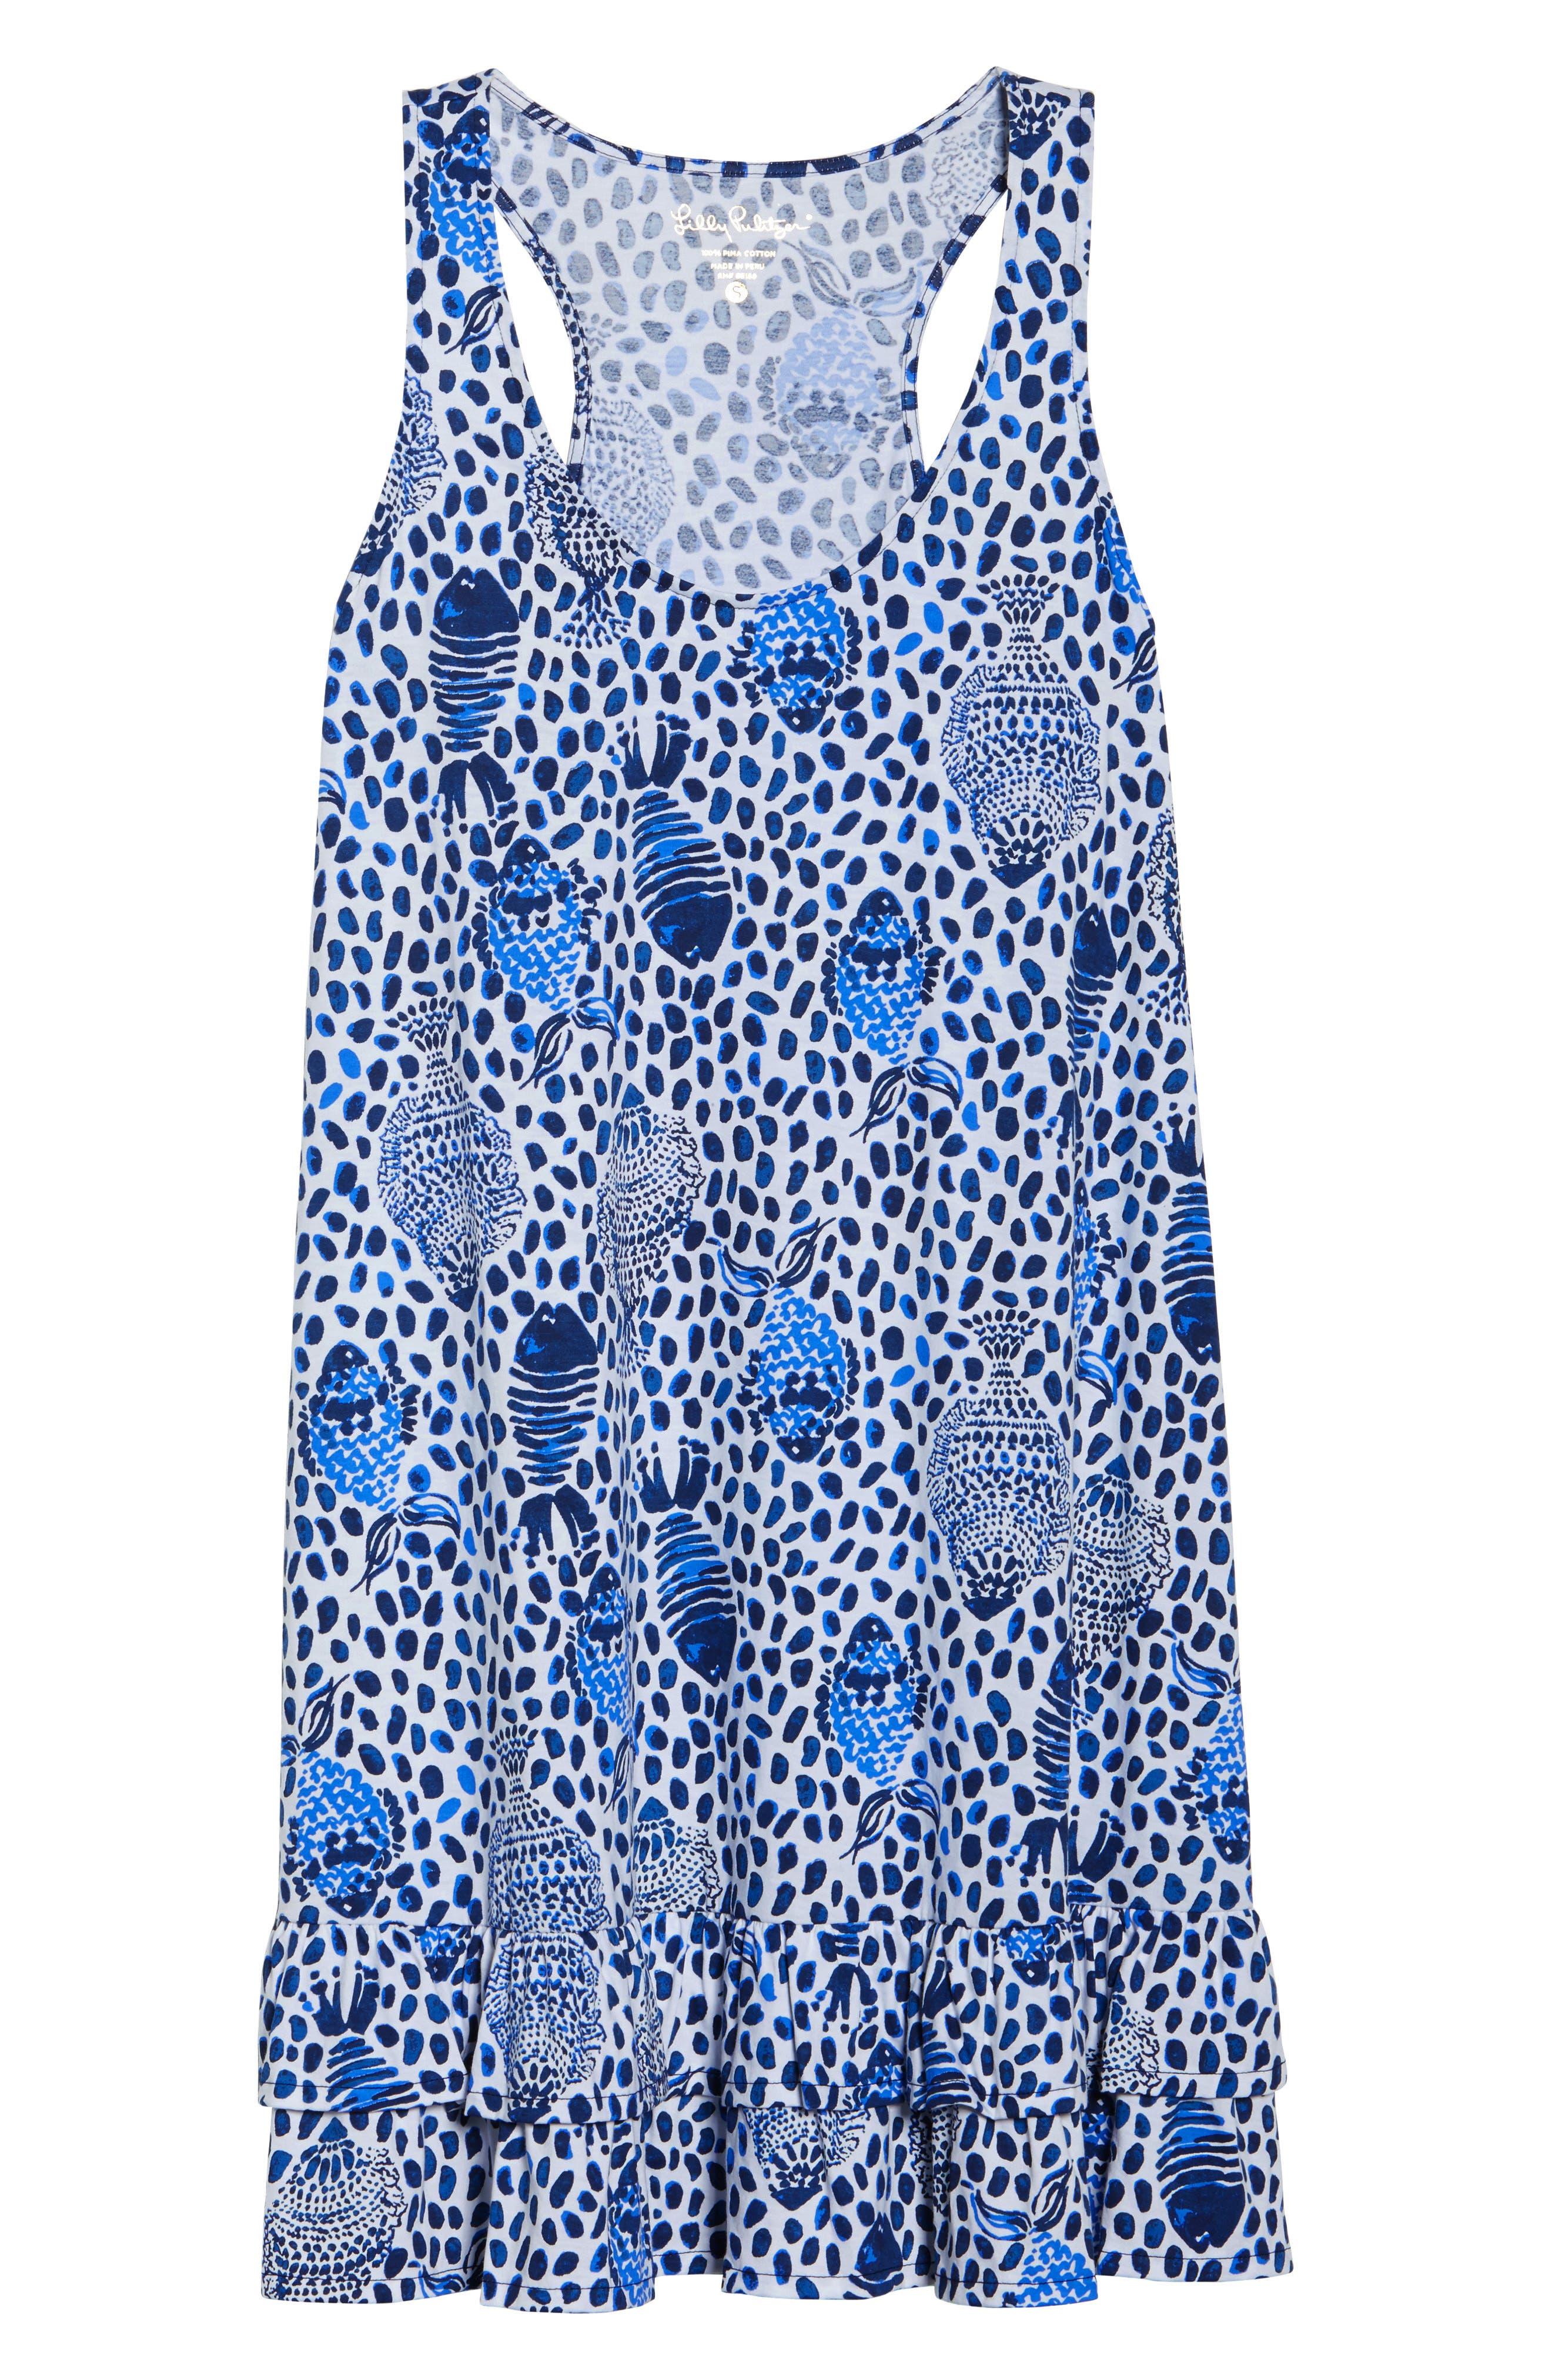 Evangelia Sleeveless Racerback Dress,                             Alternate thumbnail 6, color,                             High Tide Heart And Sole